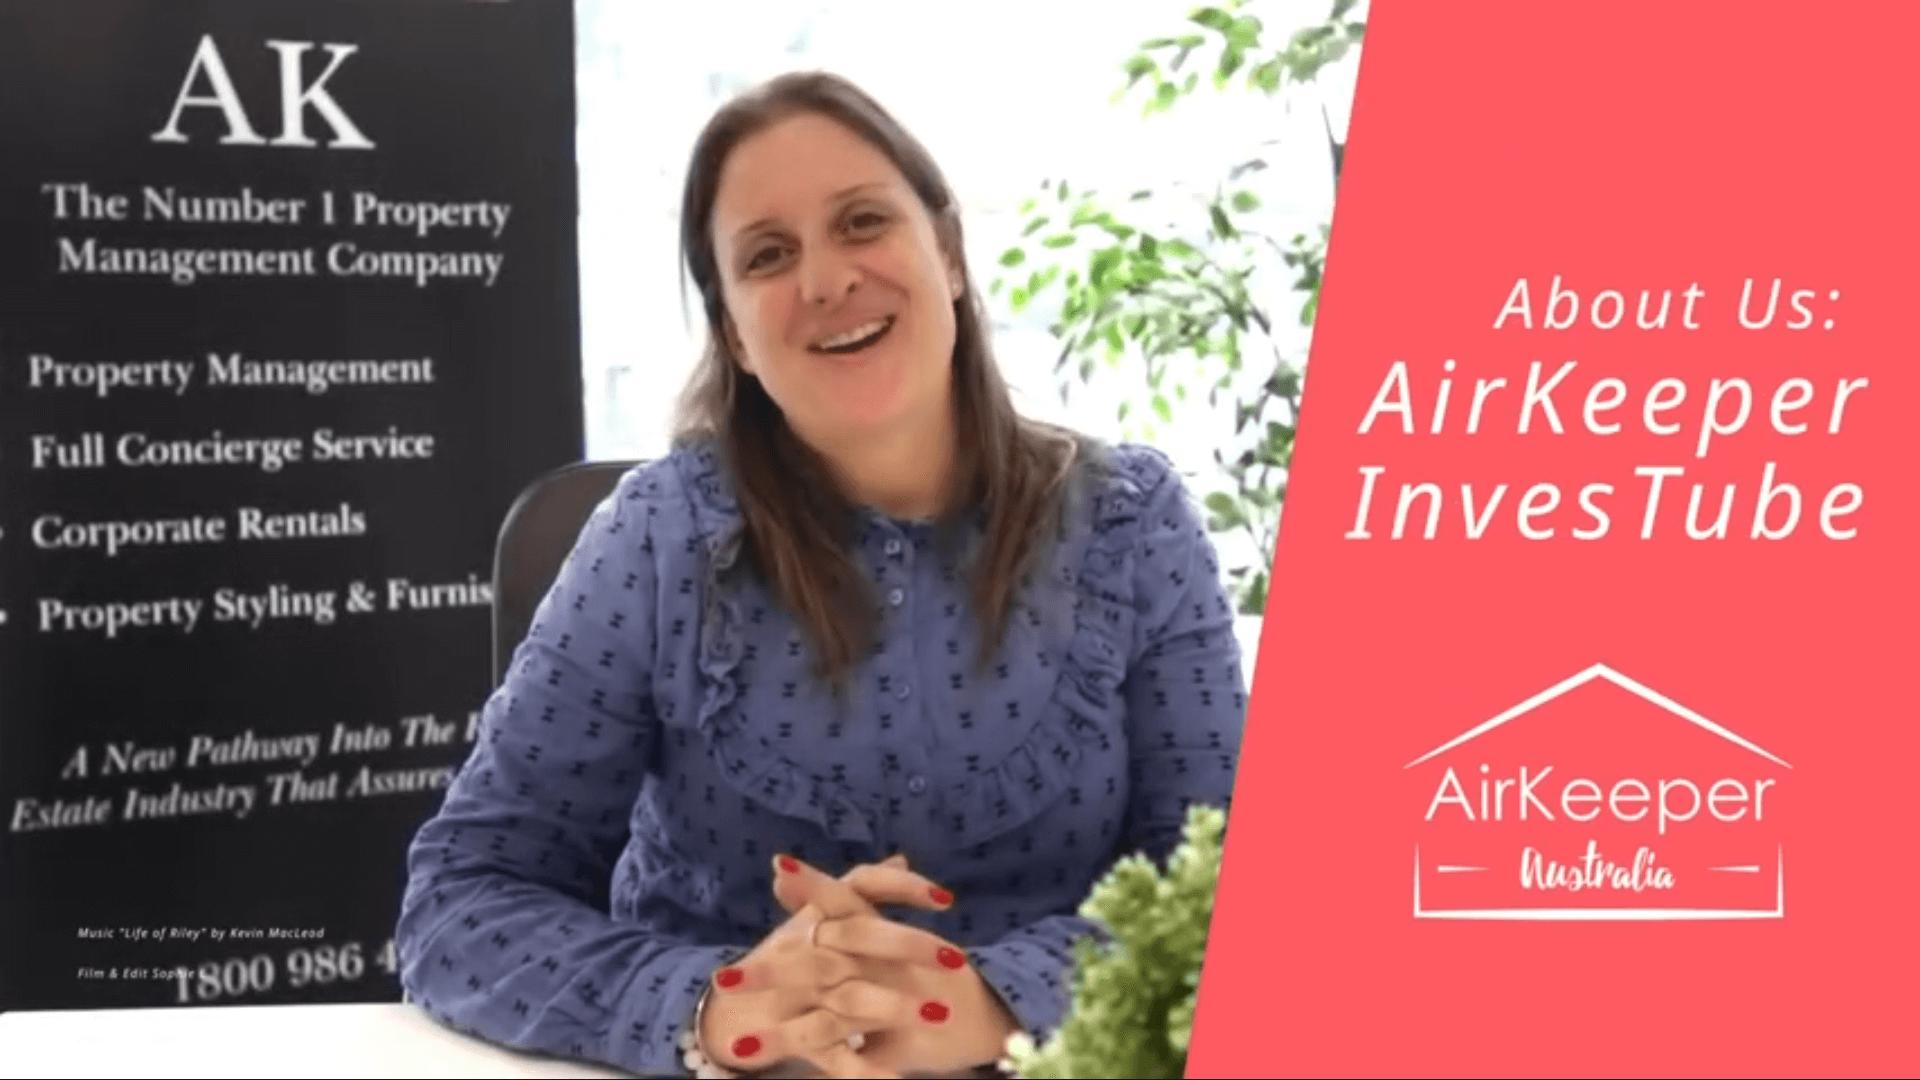 Client 3 - Airbnb Property Management -Airkeeper AU - airbnb in sydney - Airbnb Property Management -Airkeeper AU